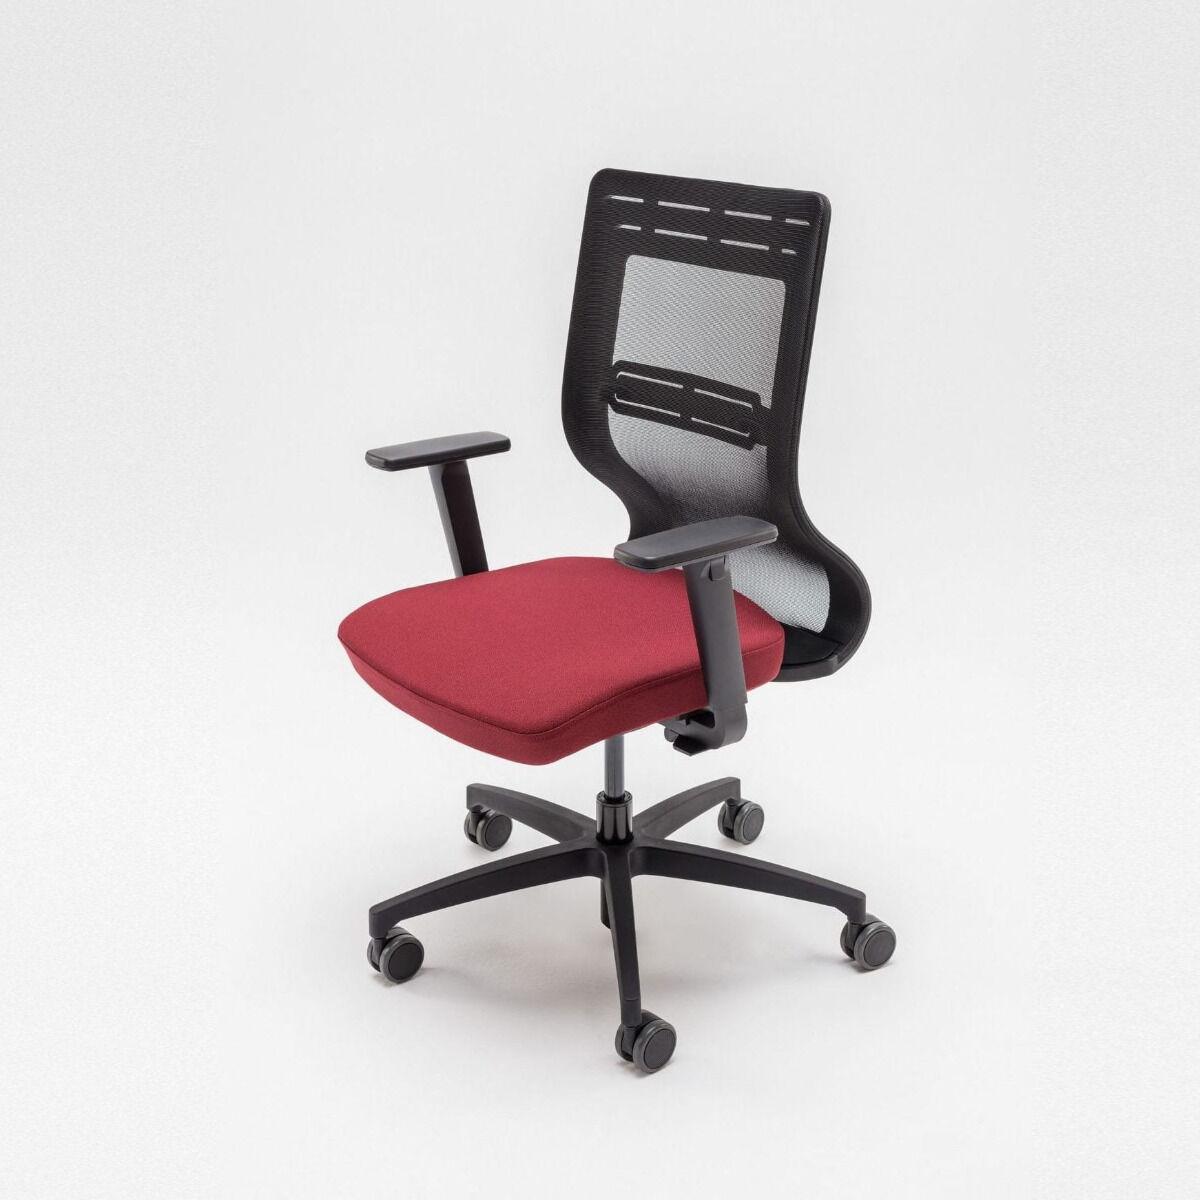 Tanya chair Fabric: Medley Colour: M64019